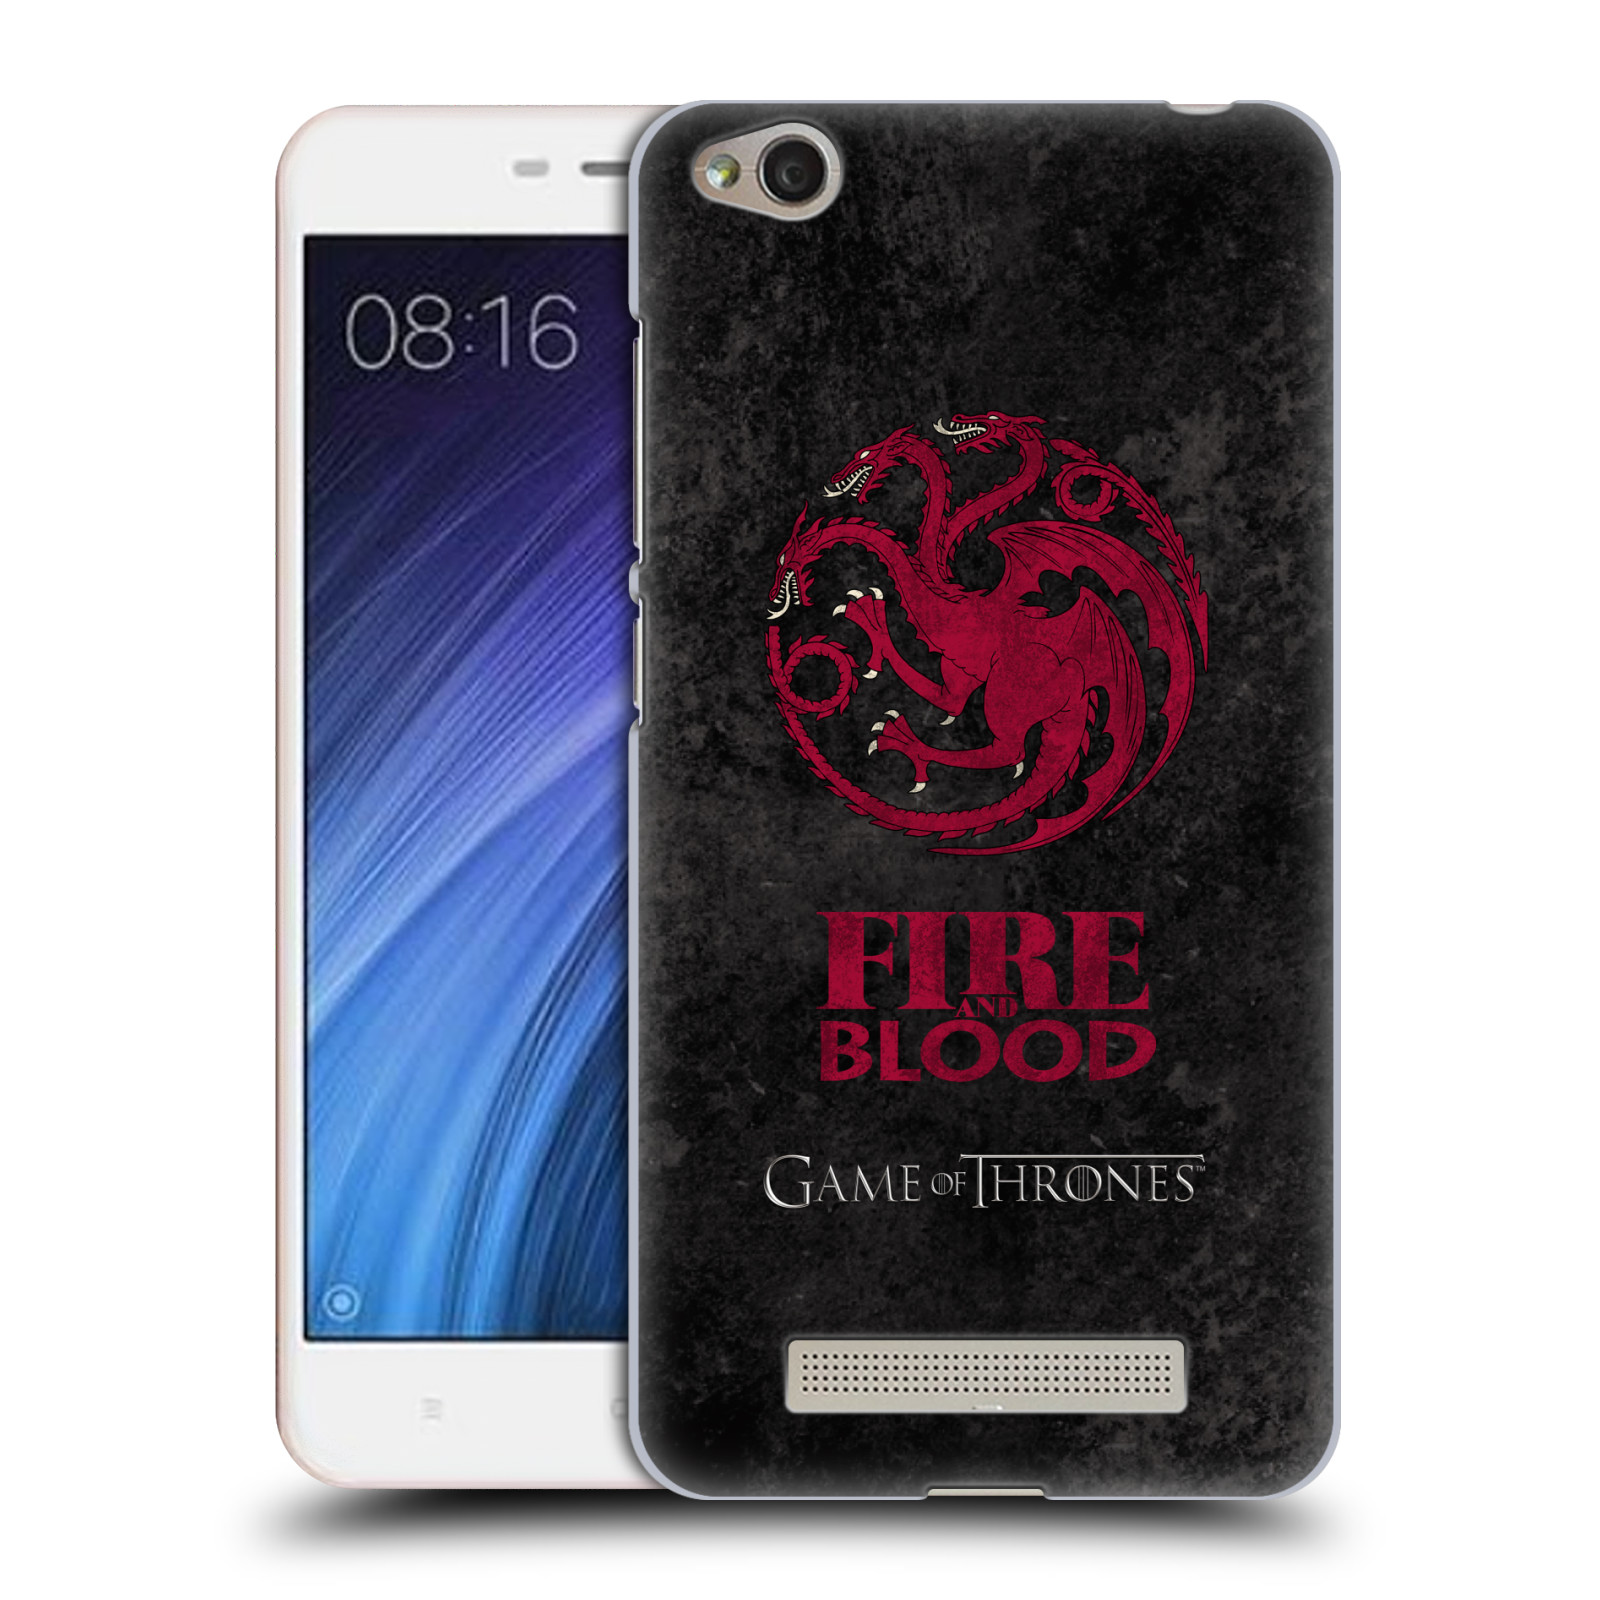 Plastové pouzdro na mobil Xiaomi Redmi 4A HEAD CASE Hra o trůny - Sigils Targaryen - Fire and Blood (Plastový kryt či obal na mobilní telefon s licencovaným motivem Hra o trůny - Game Of Thrones pro Xiaomi Redmi 4A)